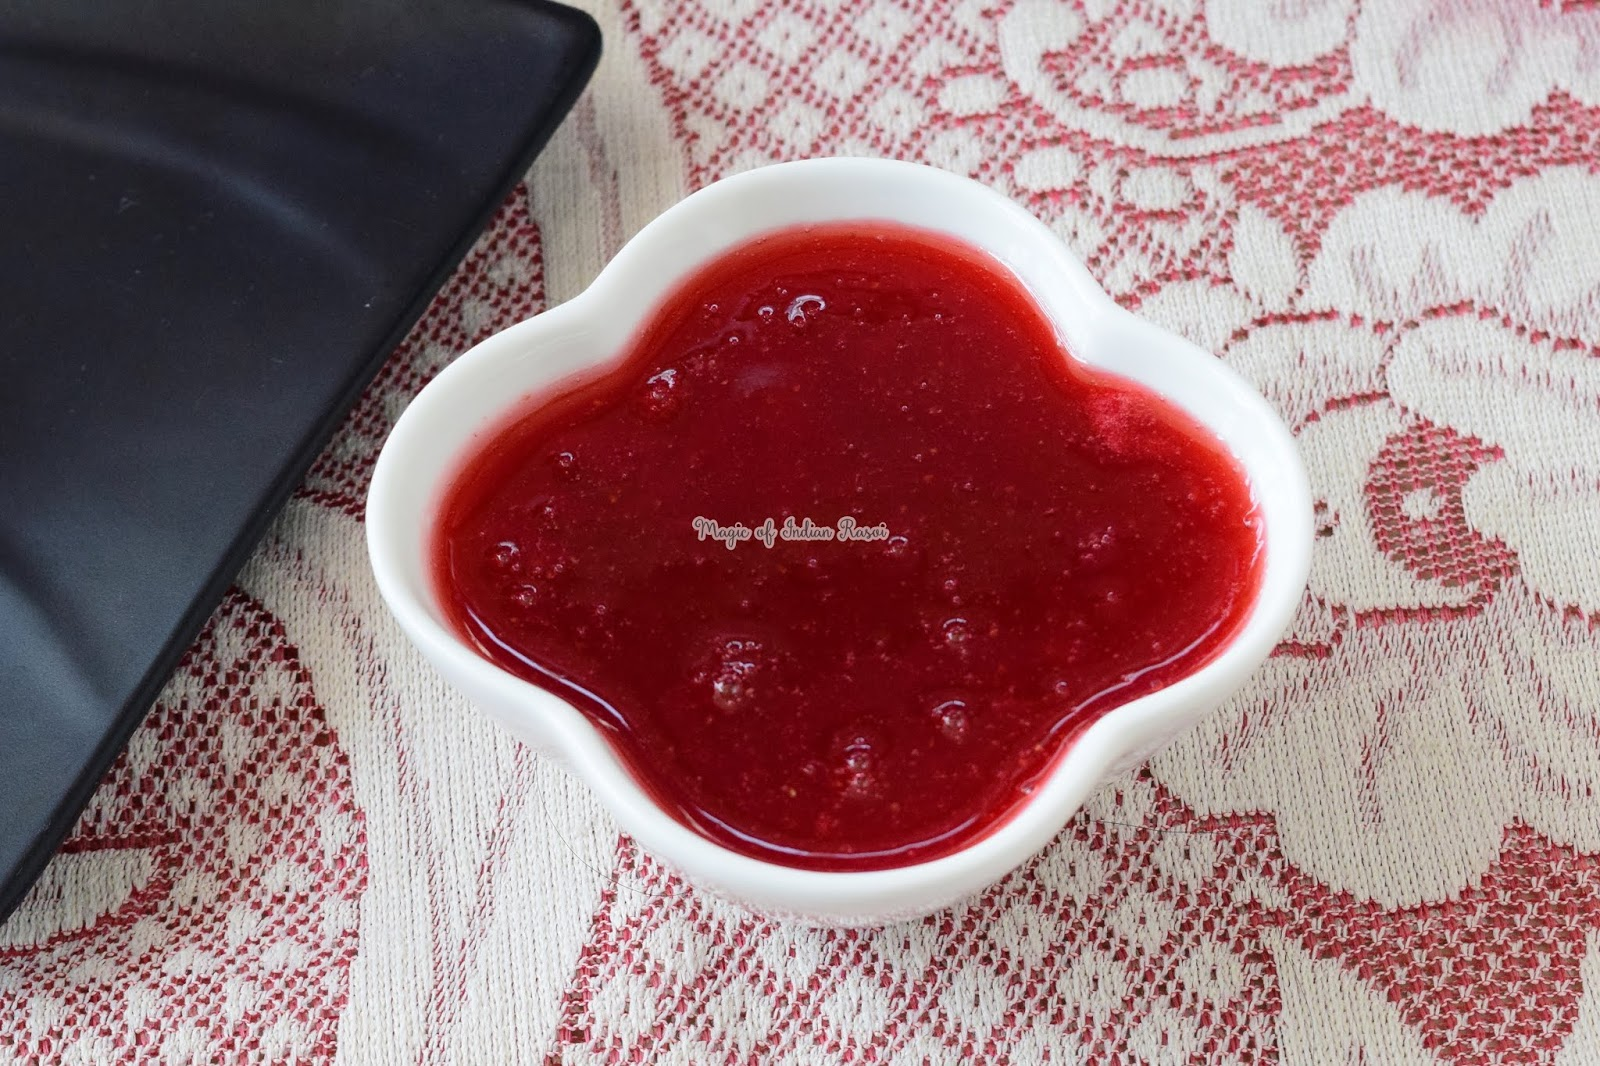 Homemade Strawberry Crush without Preservatives & Citric Acid Recipe - स्ट्रॉबेरीज क्रश सिरप बिना निम्बू के फूल और प्रेसेर्वटिवेस के  - Priya R - Magic of Indian Rasoi